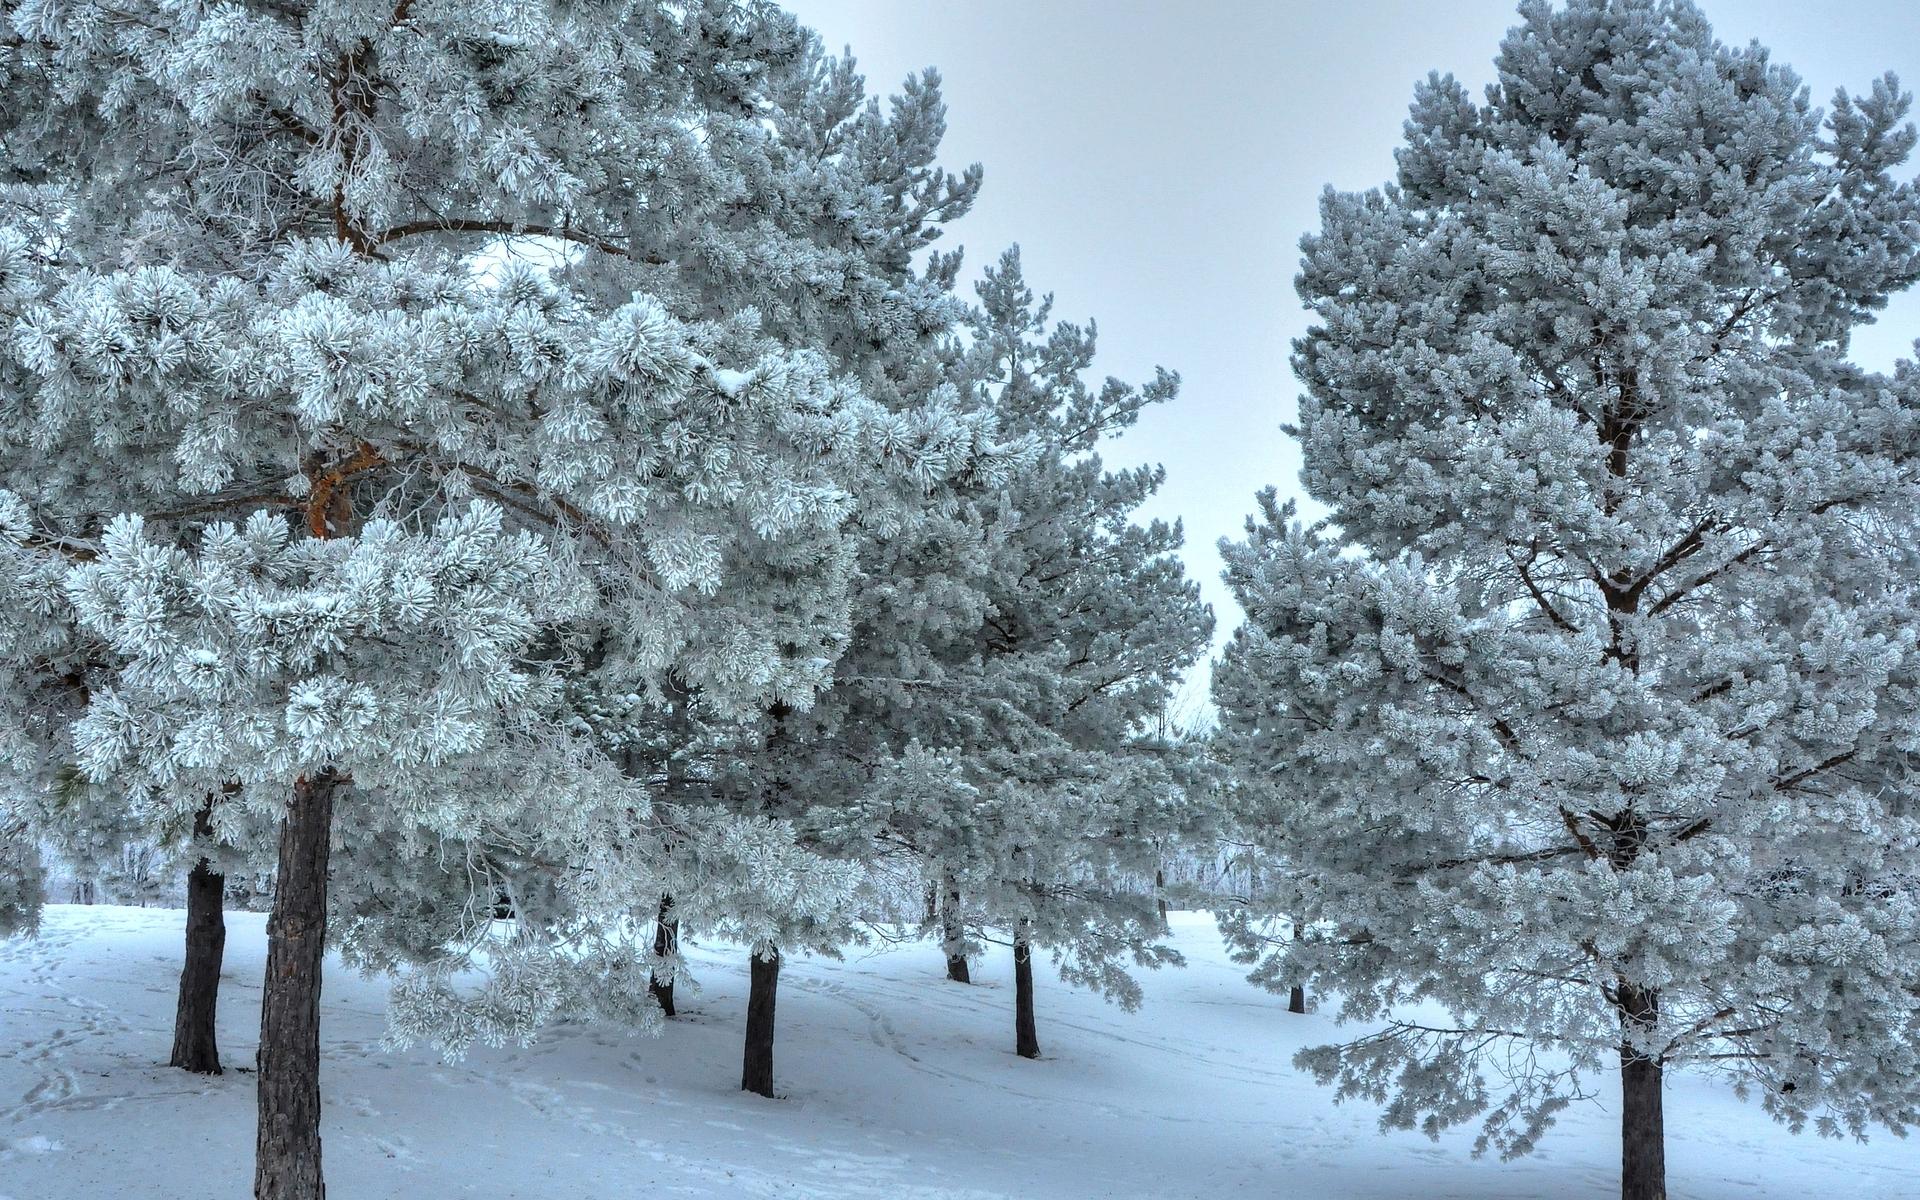 Snowy trees wallpaper 24614 1920x1200